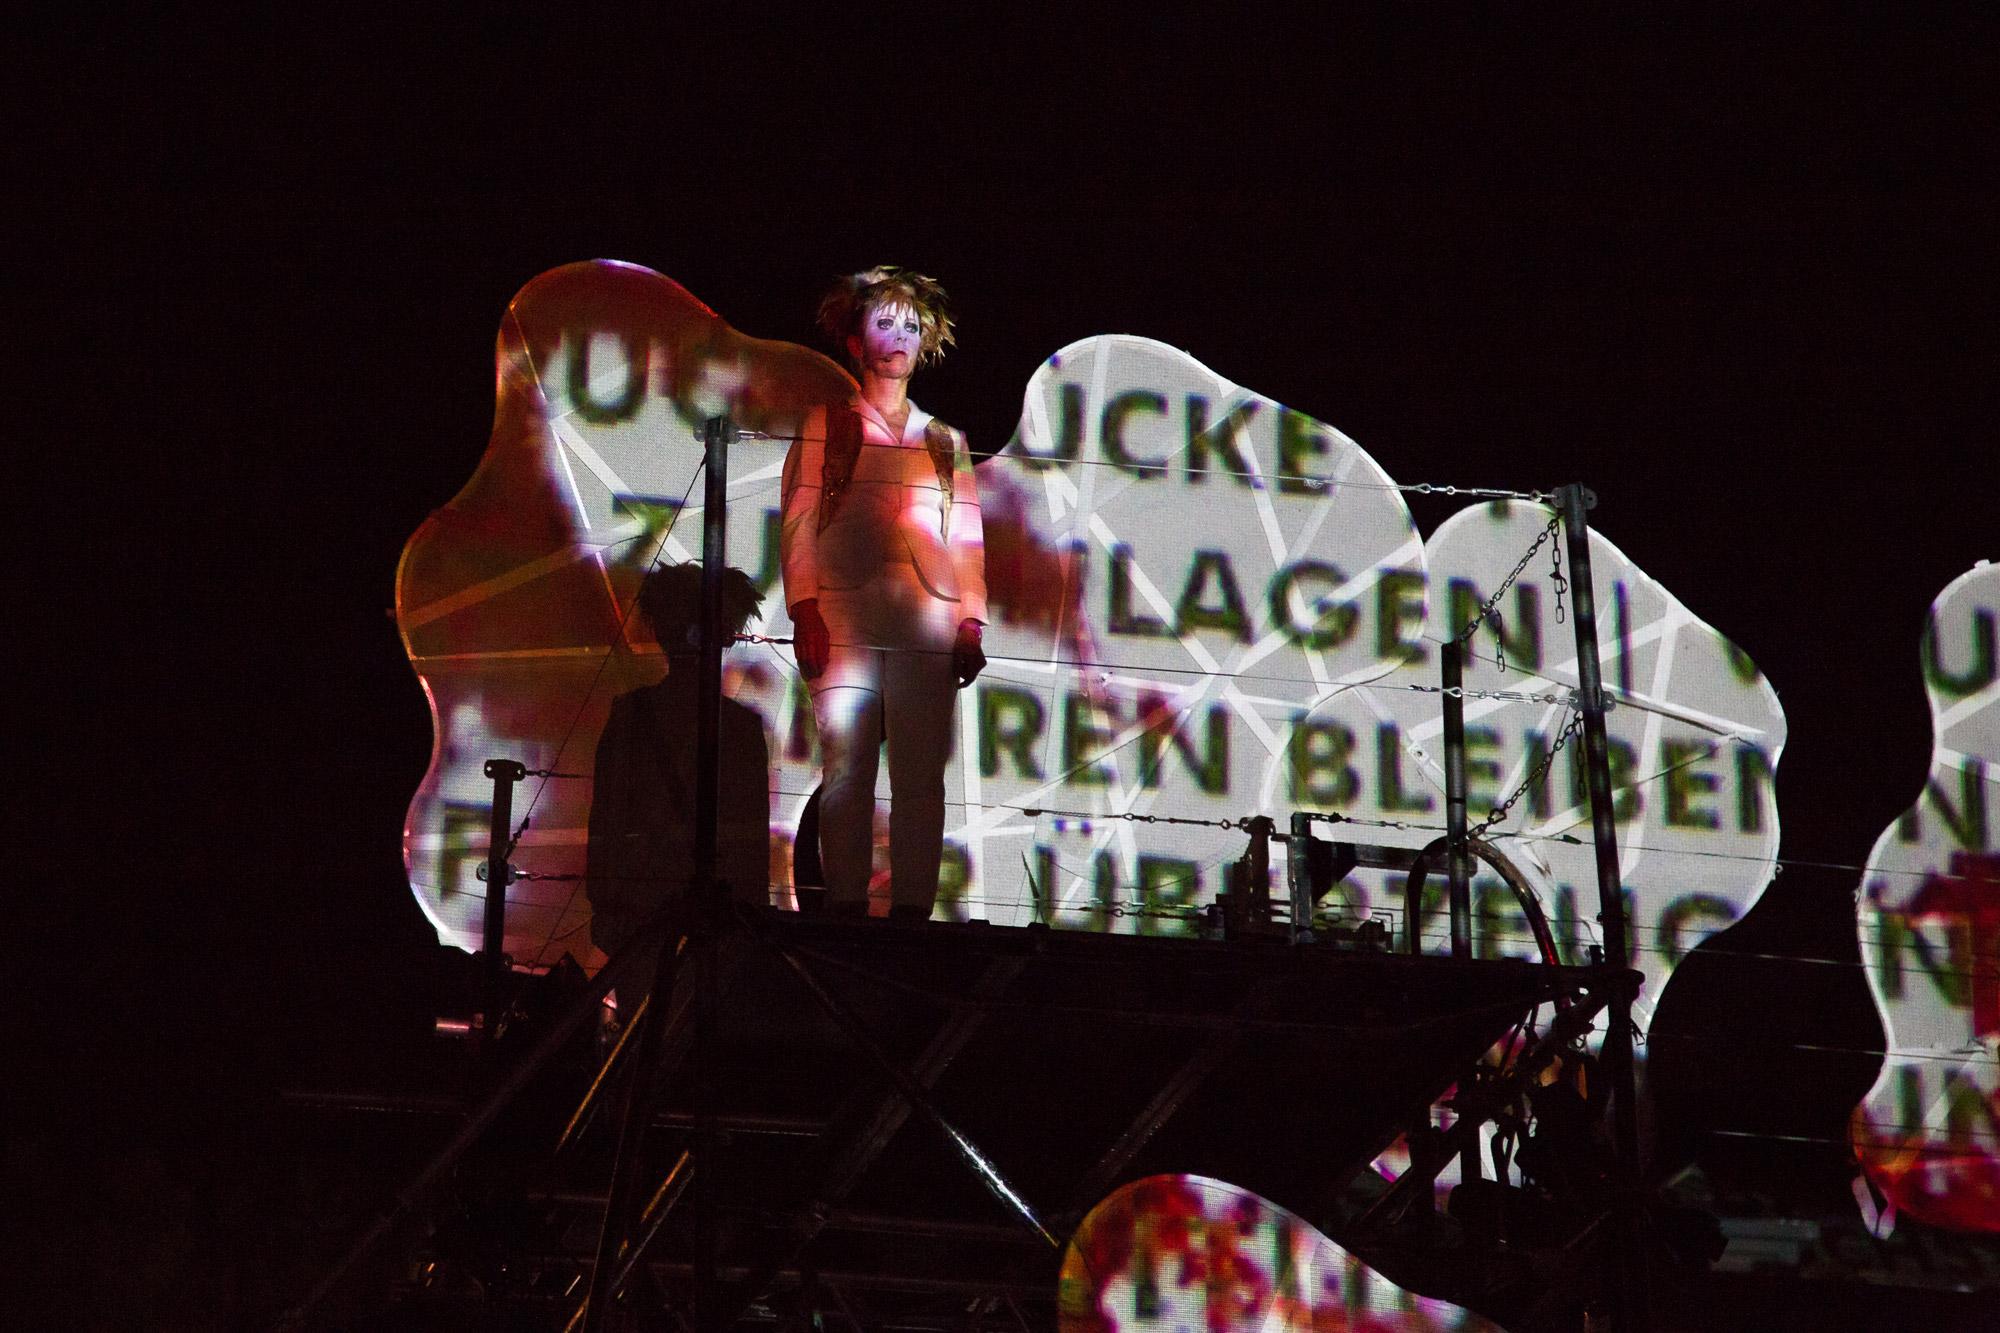 Platzinszenierung, PAN.OPTIKUM, TRANSITion, Annette Huber, Sigrun Fritsch, Pyrotechnik, Klaus Ulrich, Matthias Rettner